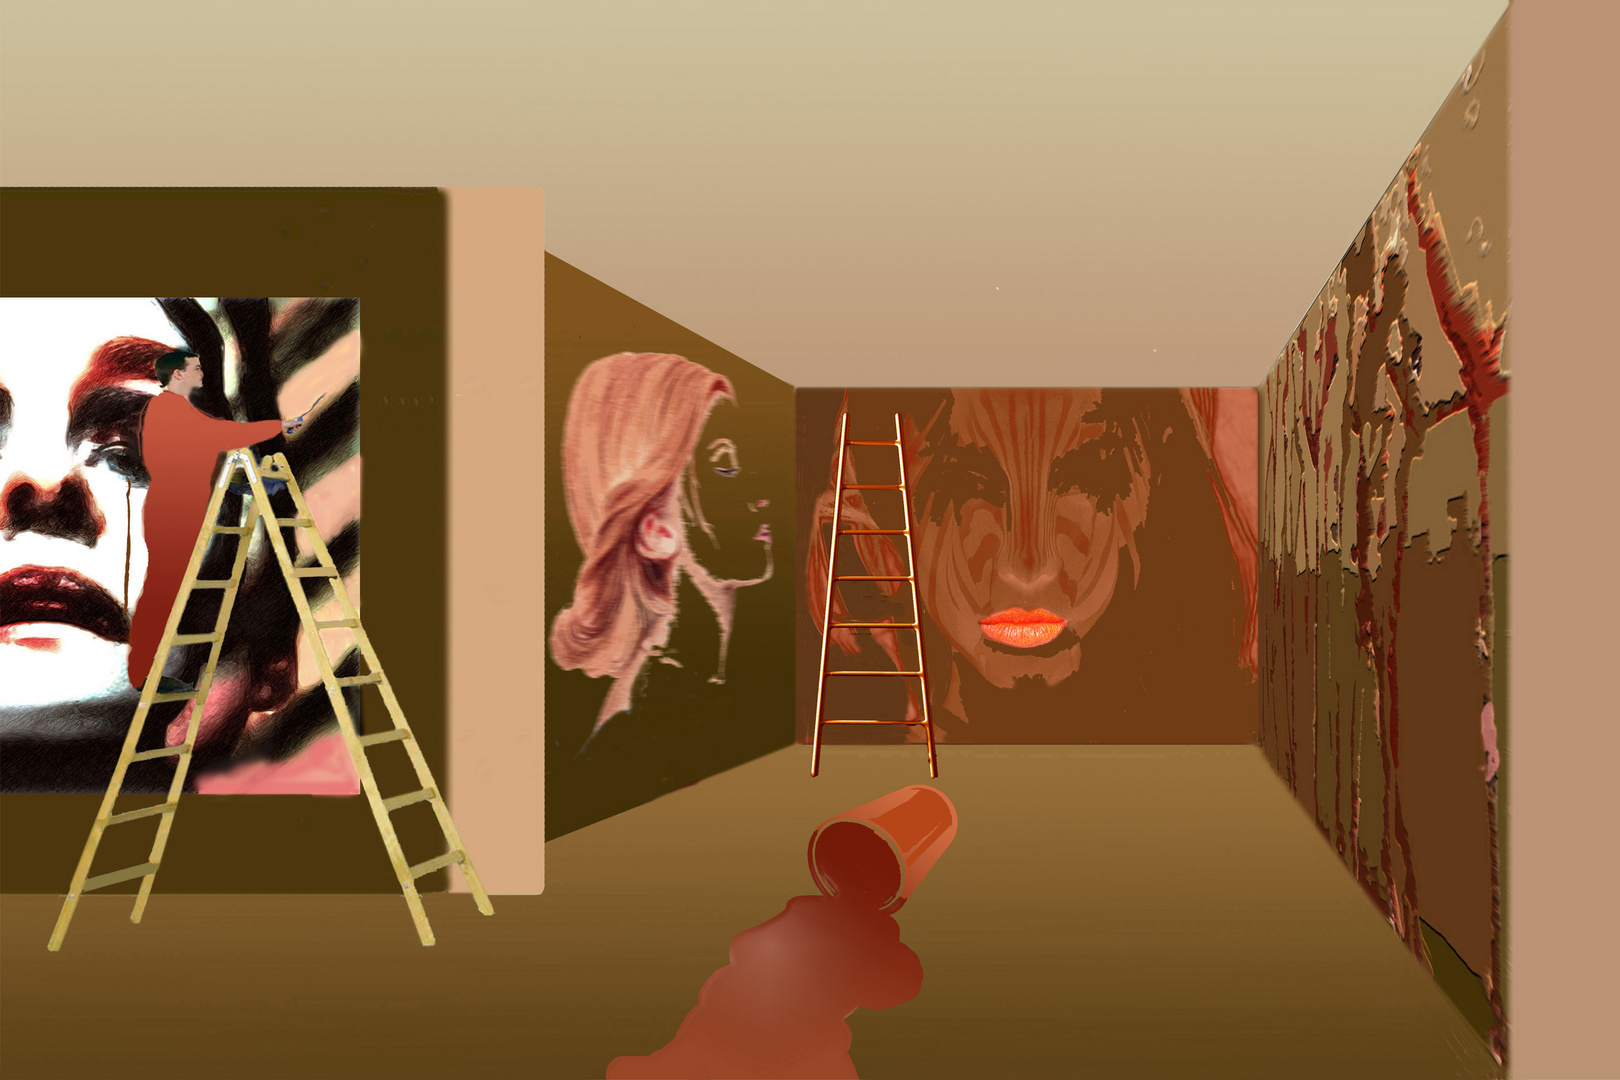 Der Maler malt - Painting